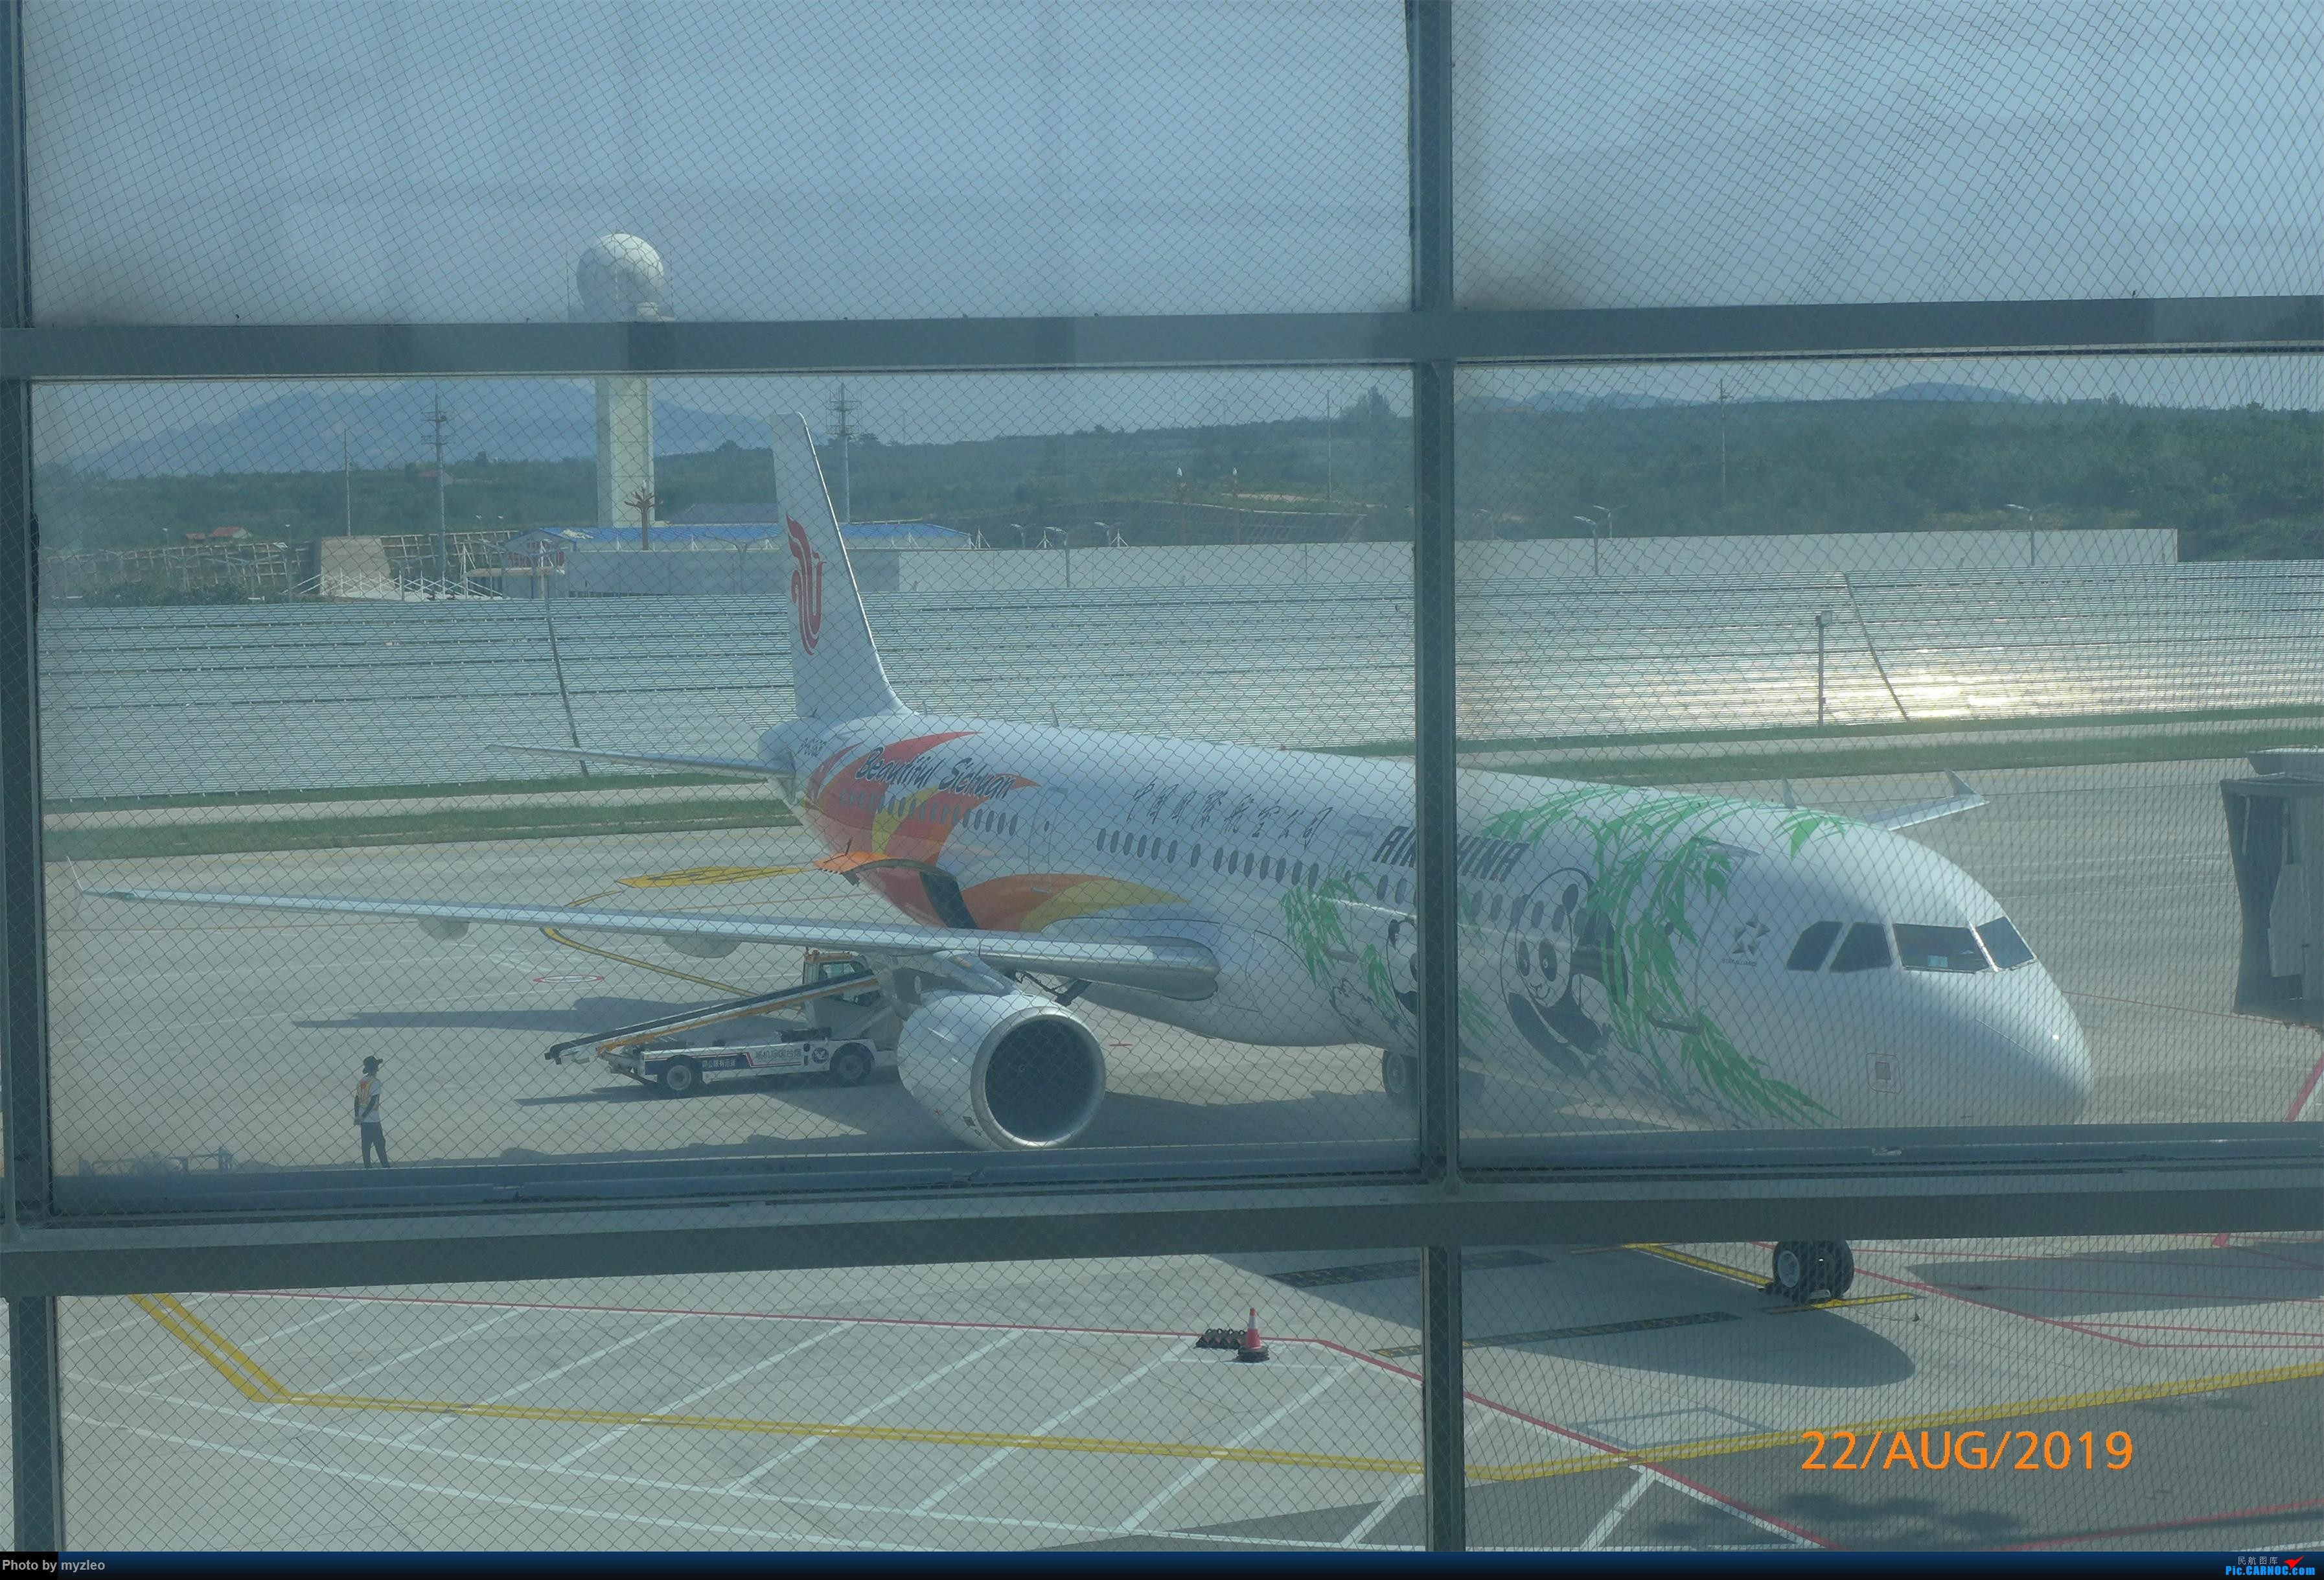 Re:[原创]【myzleo的游记5.2】梦圆一九(2)首访南苑把梦圆,初搭巴航连新缘 AIRBUS A321-200 B-6365 中国烟台蓬莱国际机场